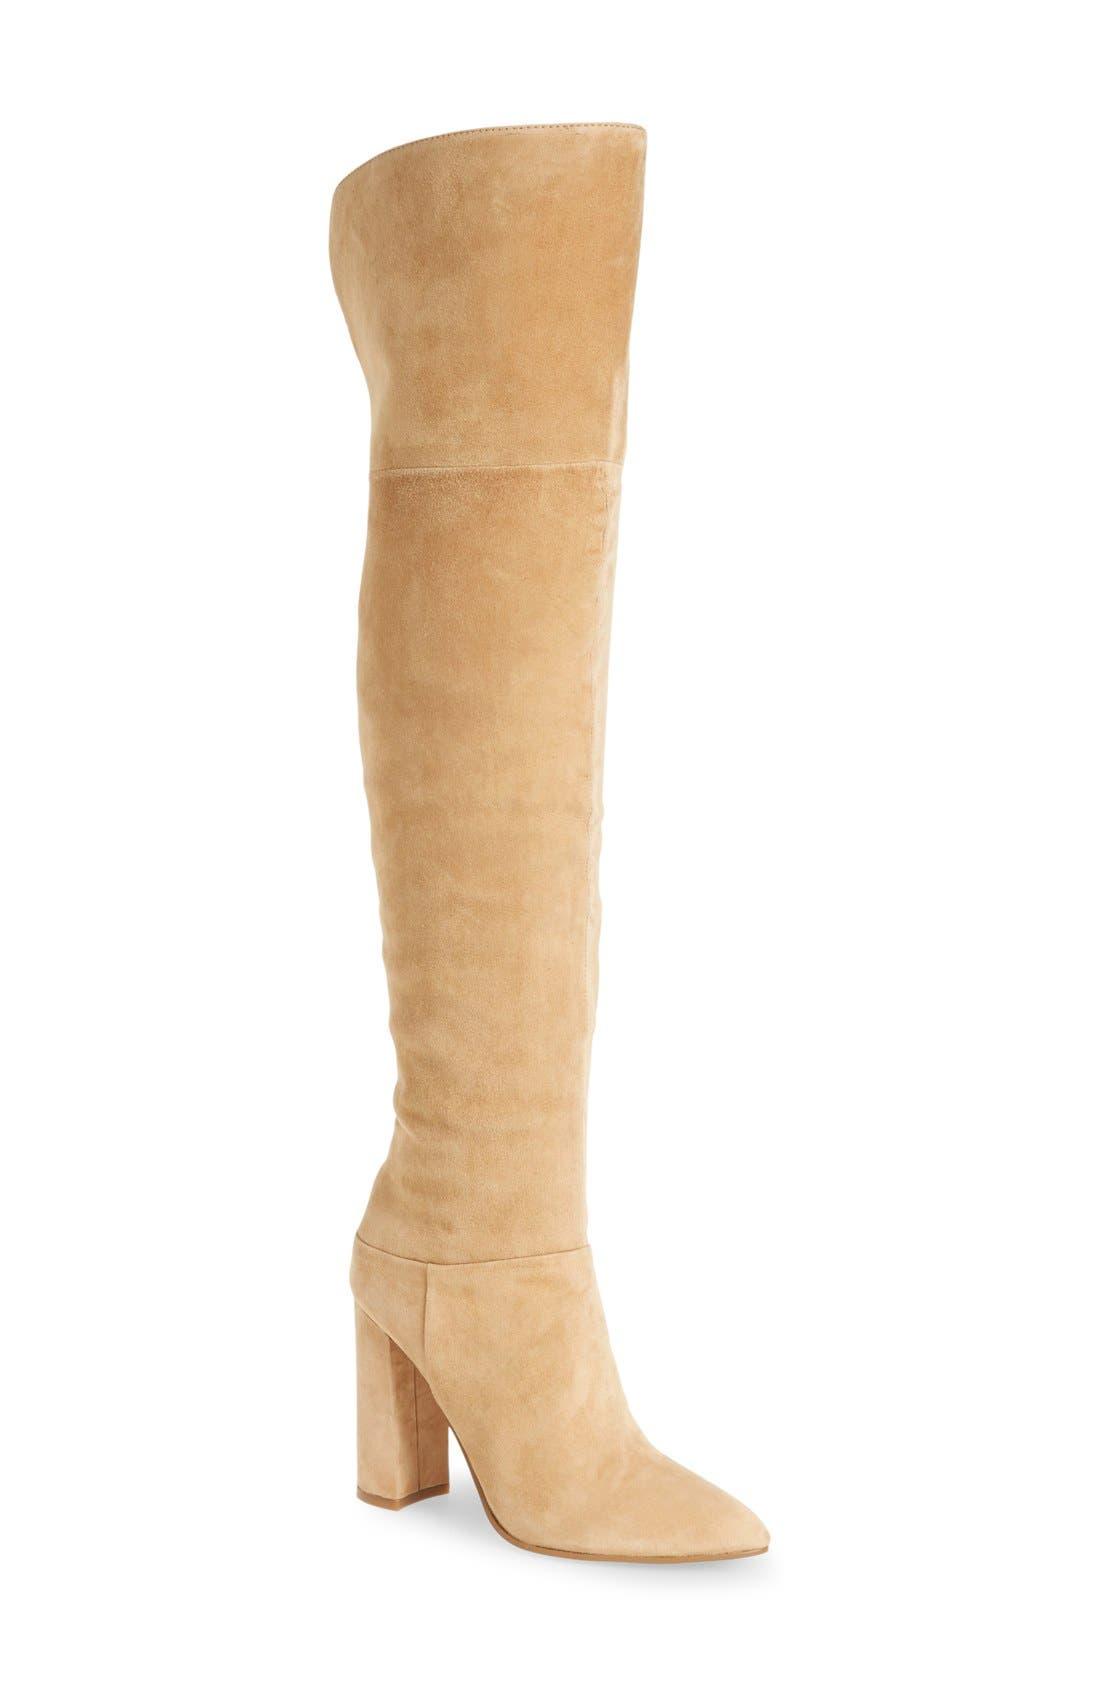 Alternate Image 1 Selected - Marc Fisher LTD 'Breley' Over the Knee Boot (Women)